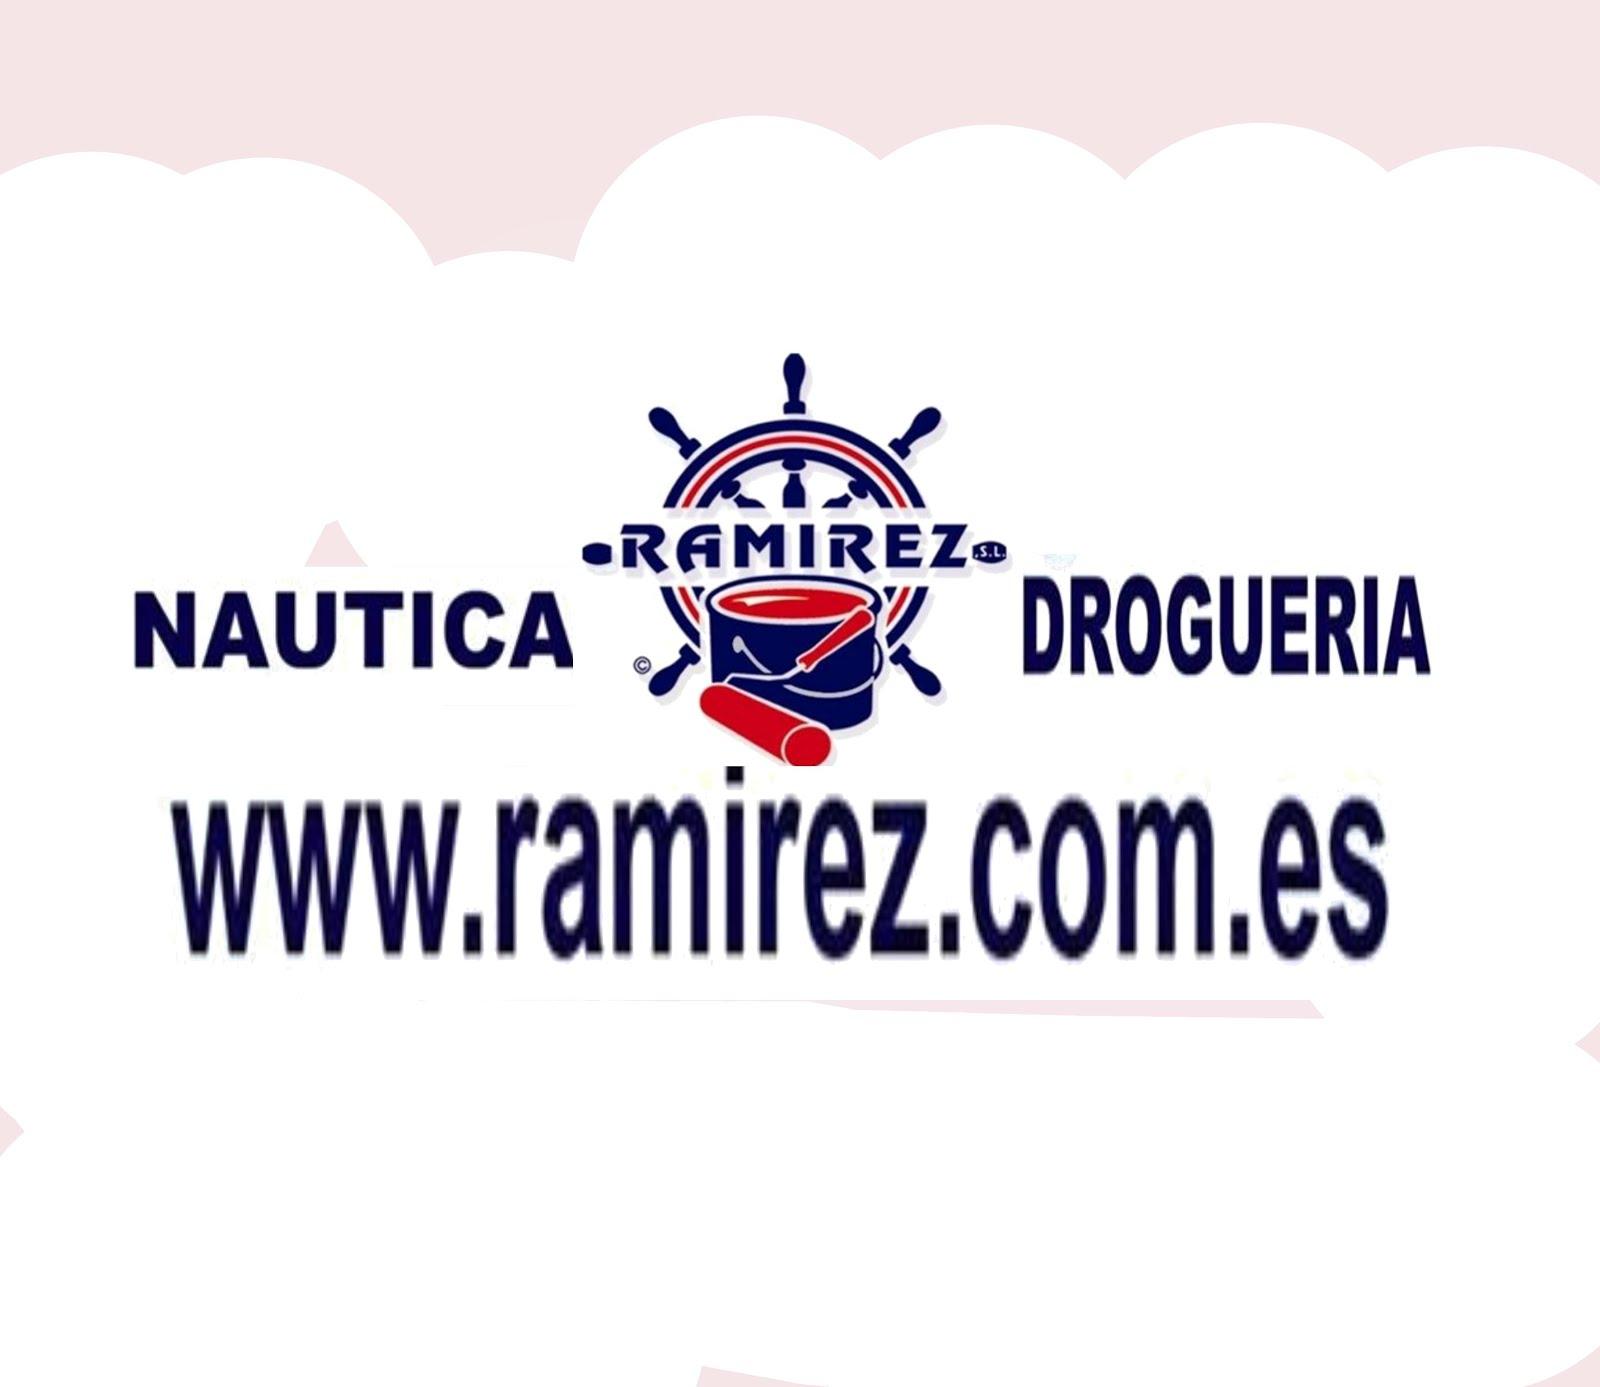 NAUTICA DROGUERIA RAMIREZ